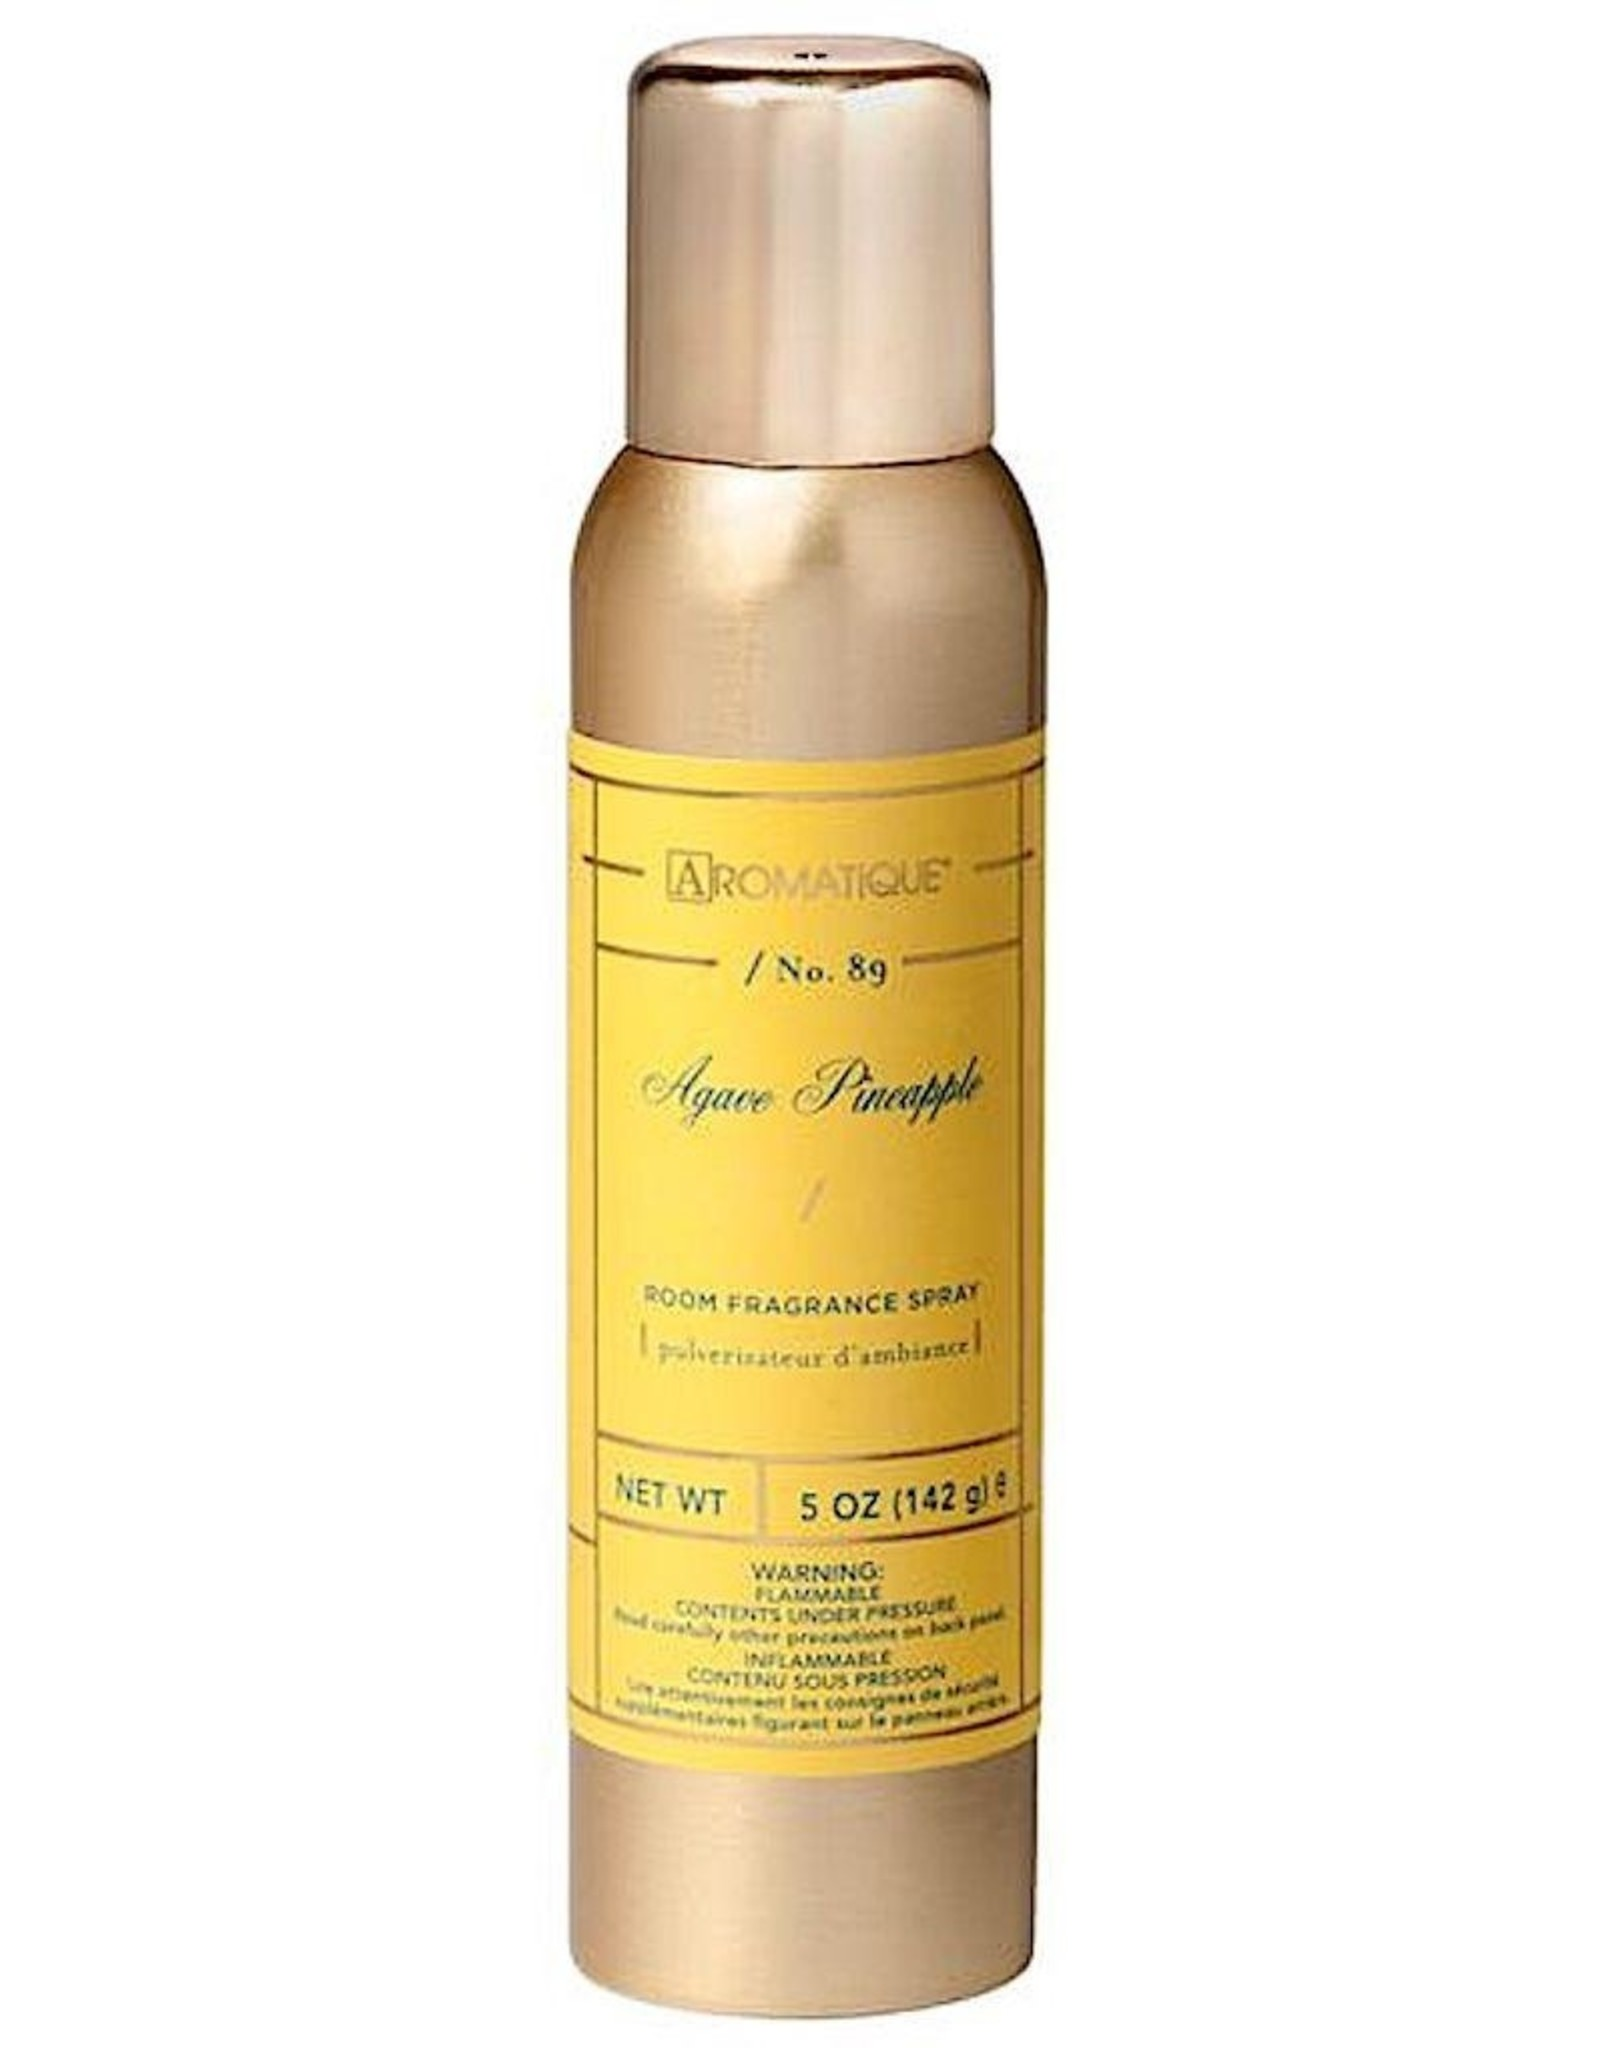 Aromatique Agave Pineapple Aerosol Room Spray 5oz 81-148